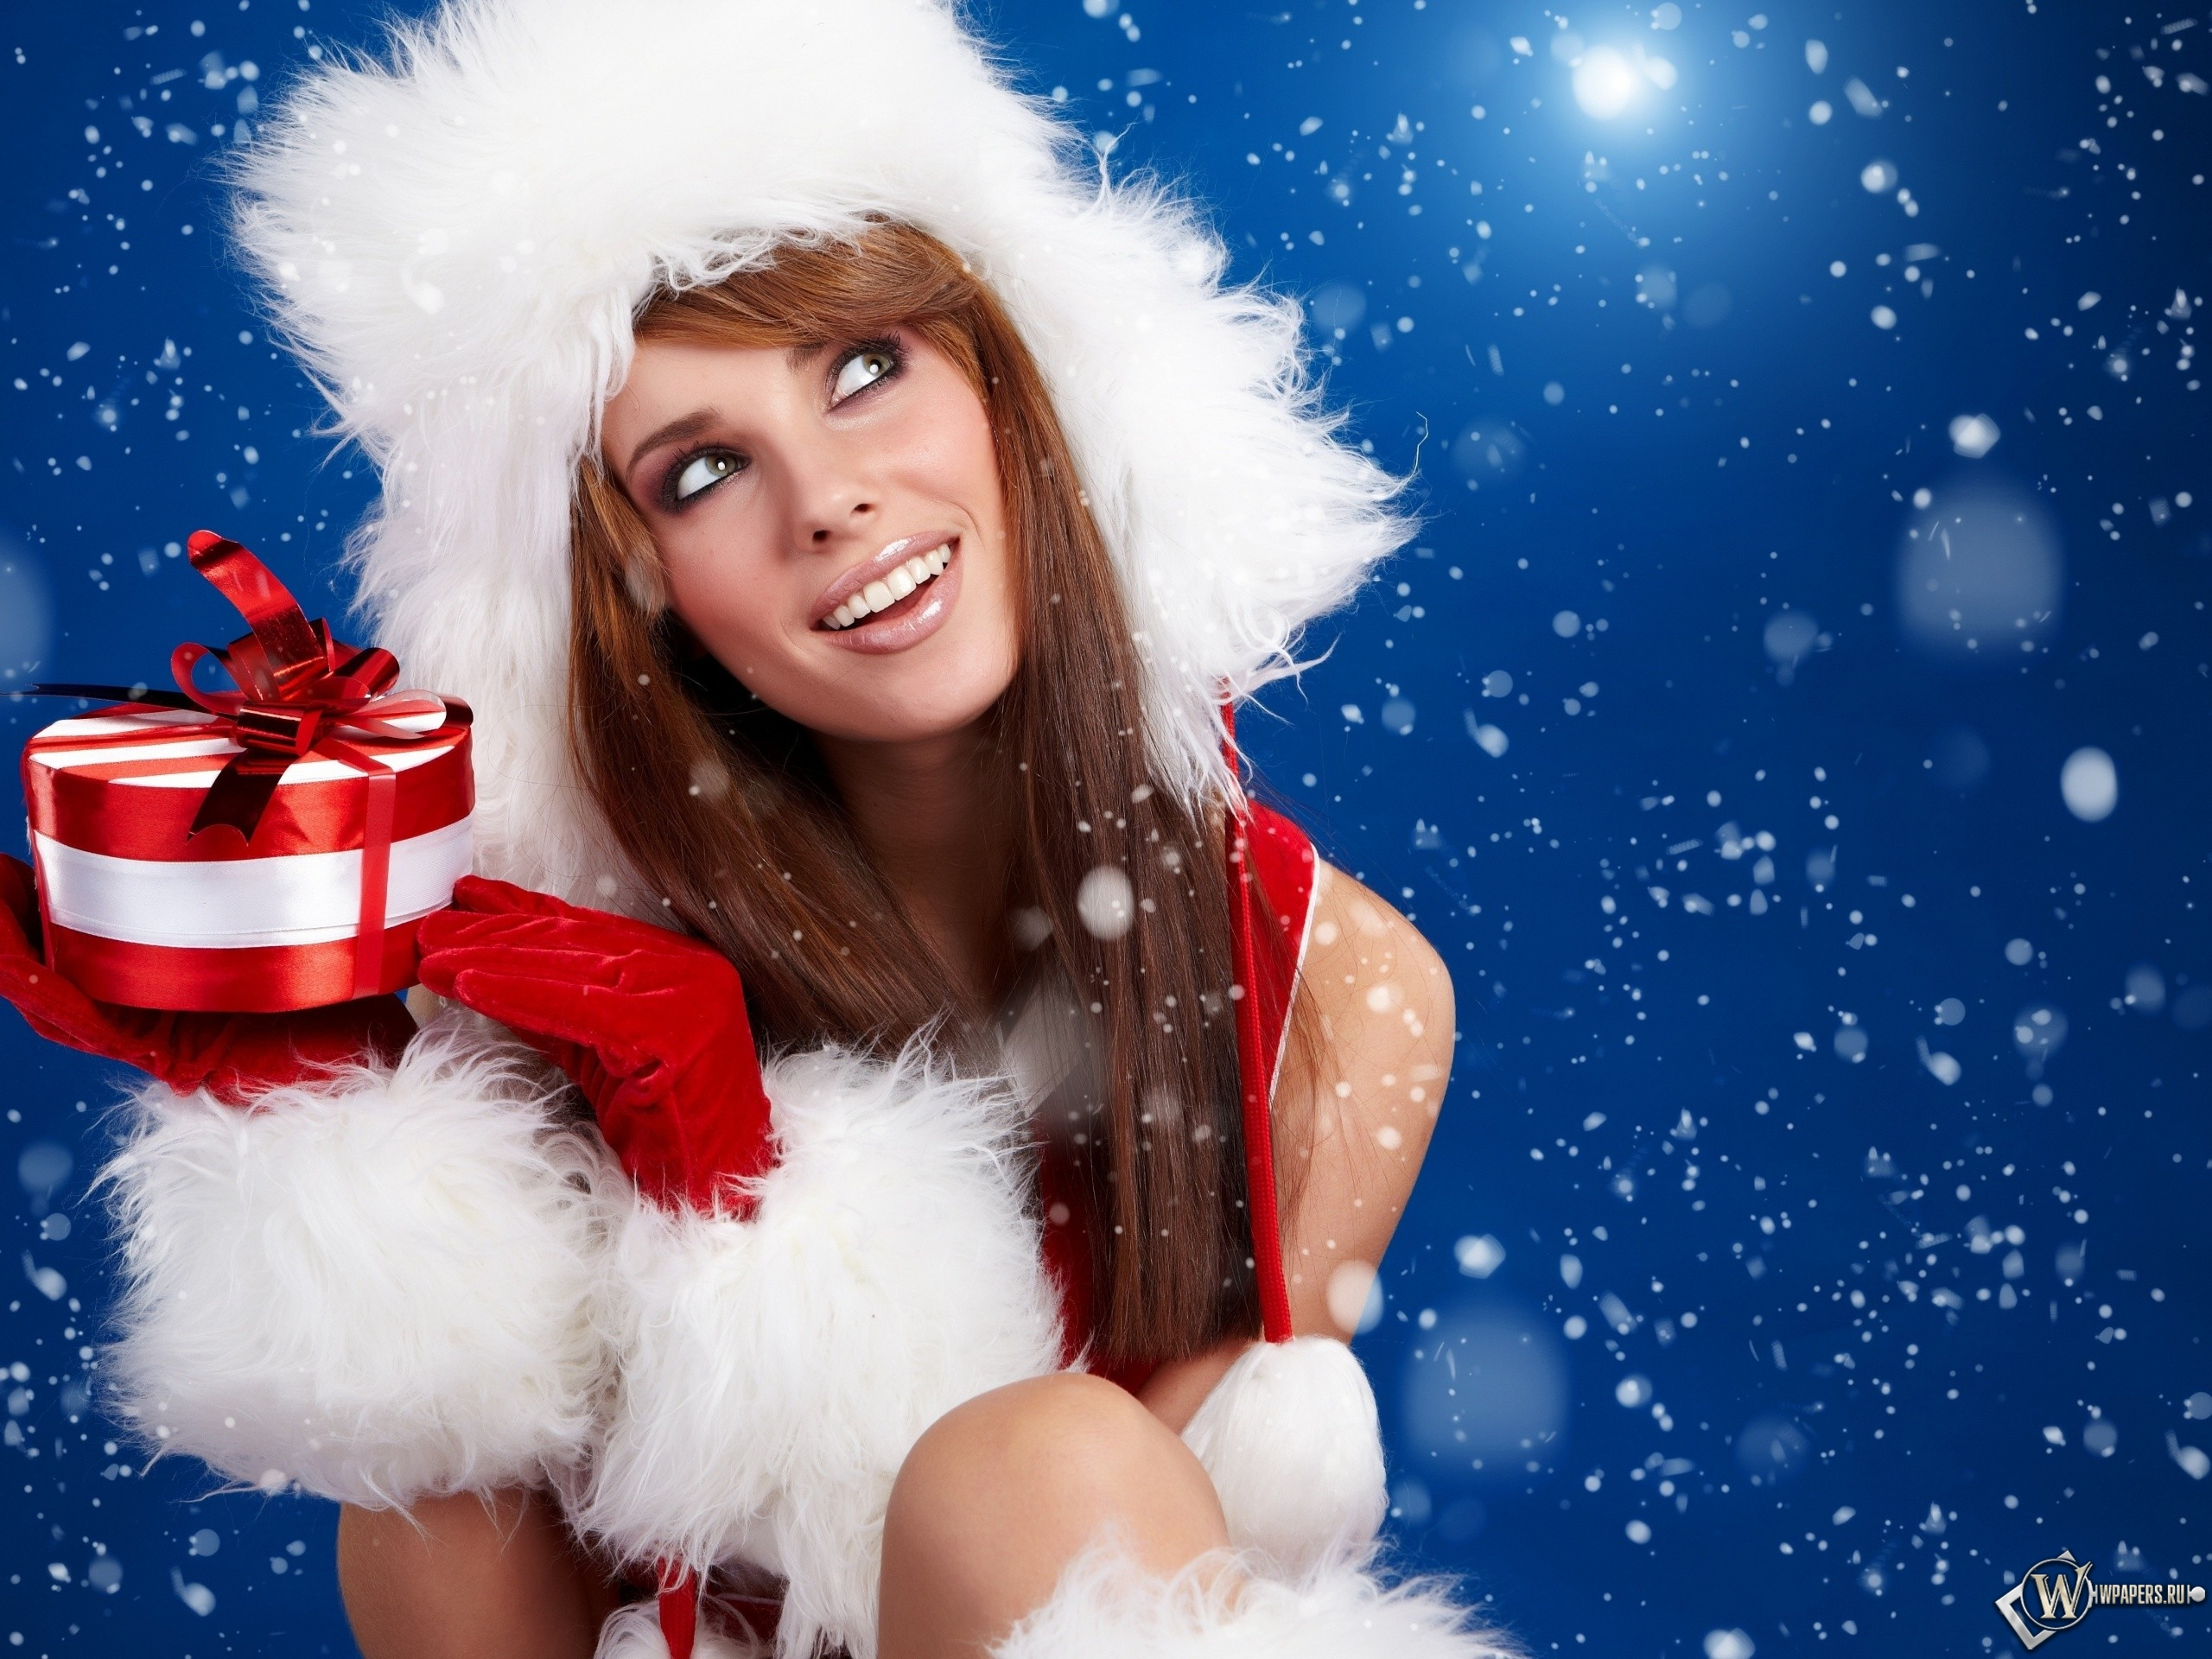 Снегурочка с подарком 2560x1920